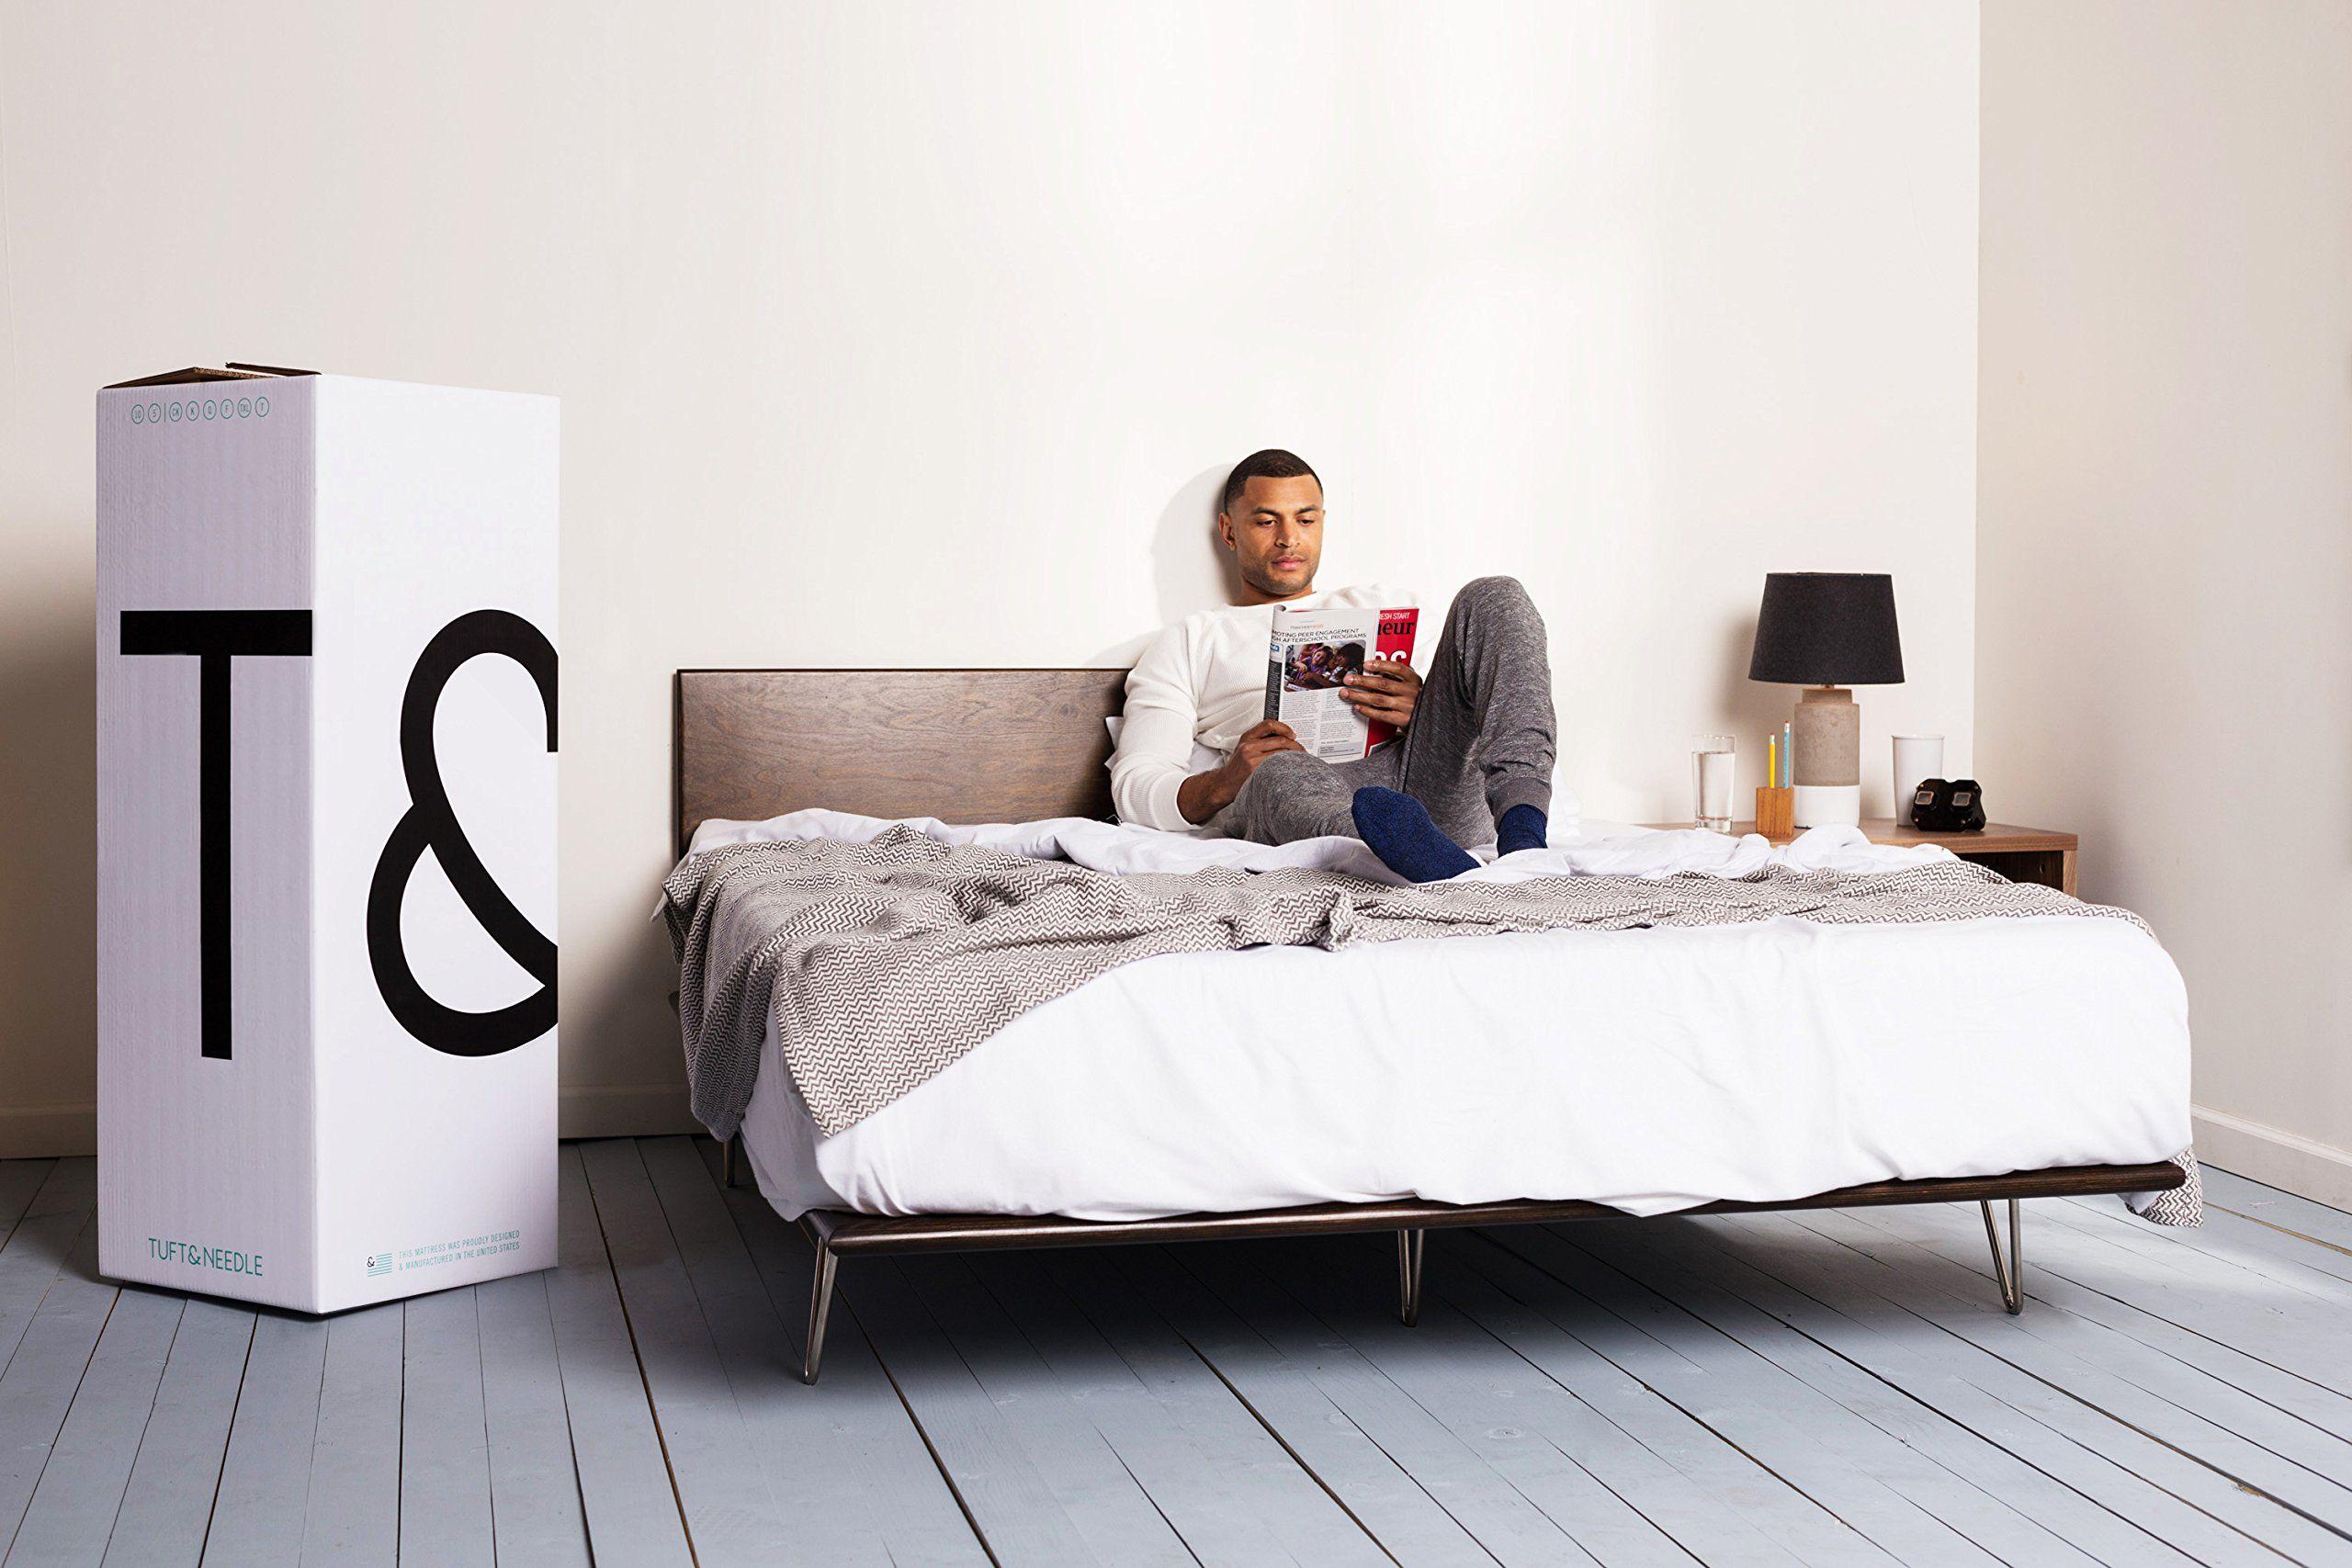 Gerstner Thick Hypoallergenic 2 Down Alternative Bed Mattress Topper In 2020 Comfort Mattress Mattress Mattress Topper